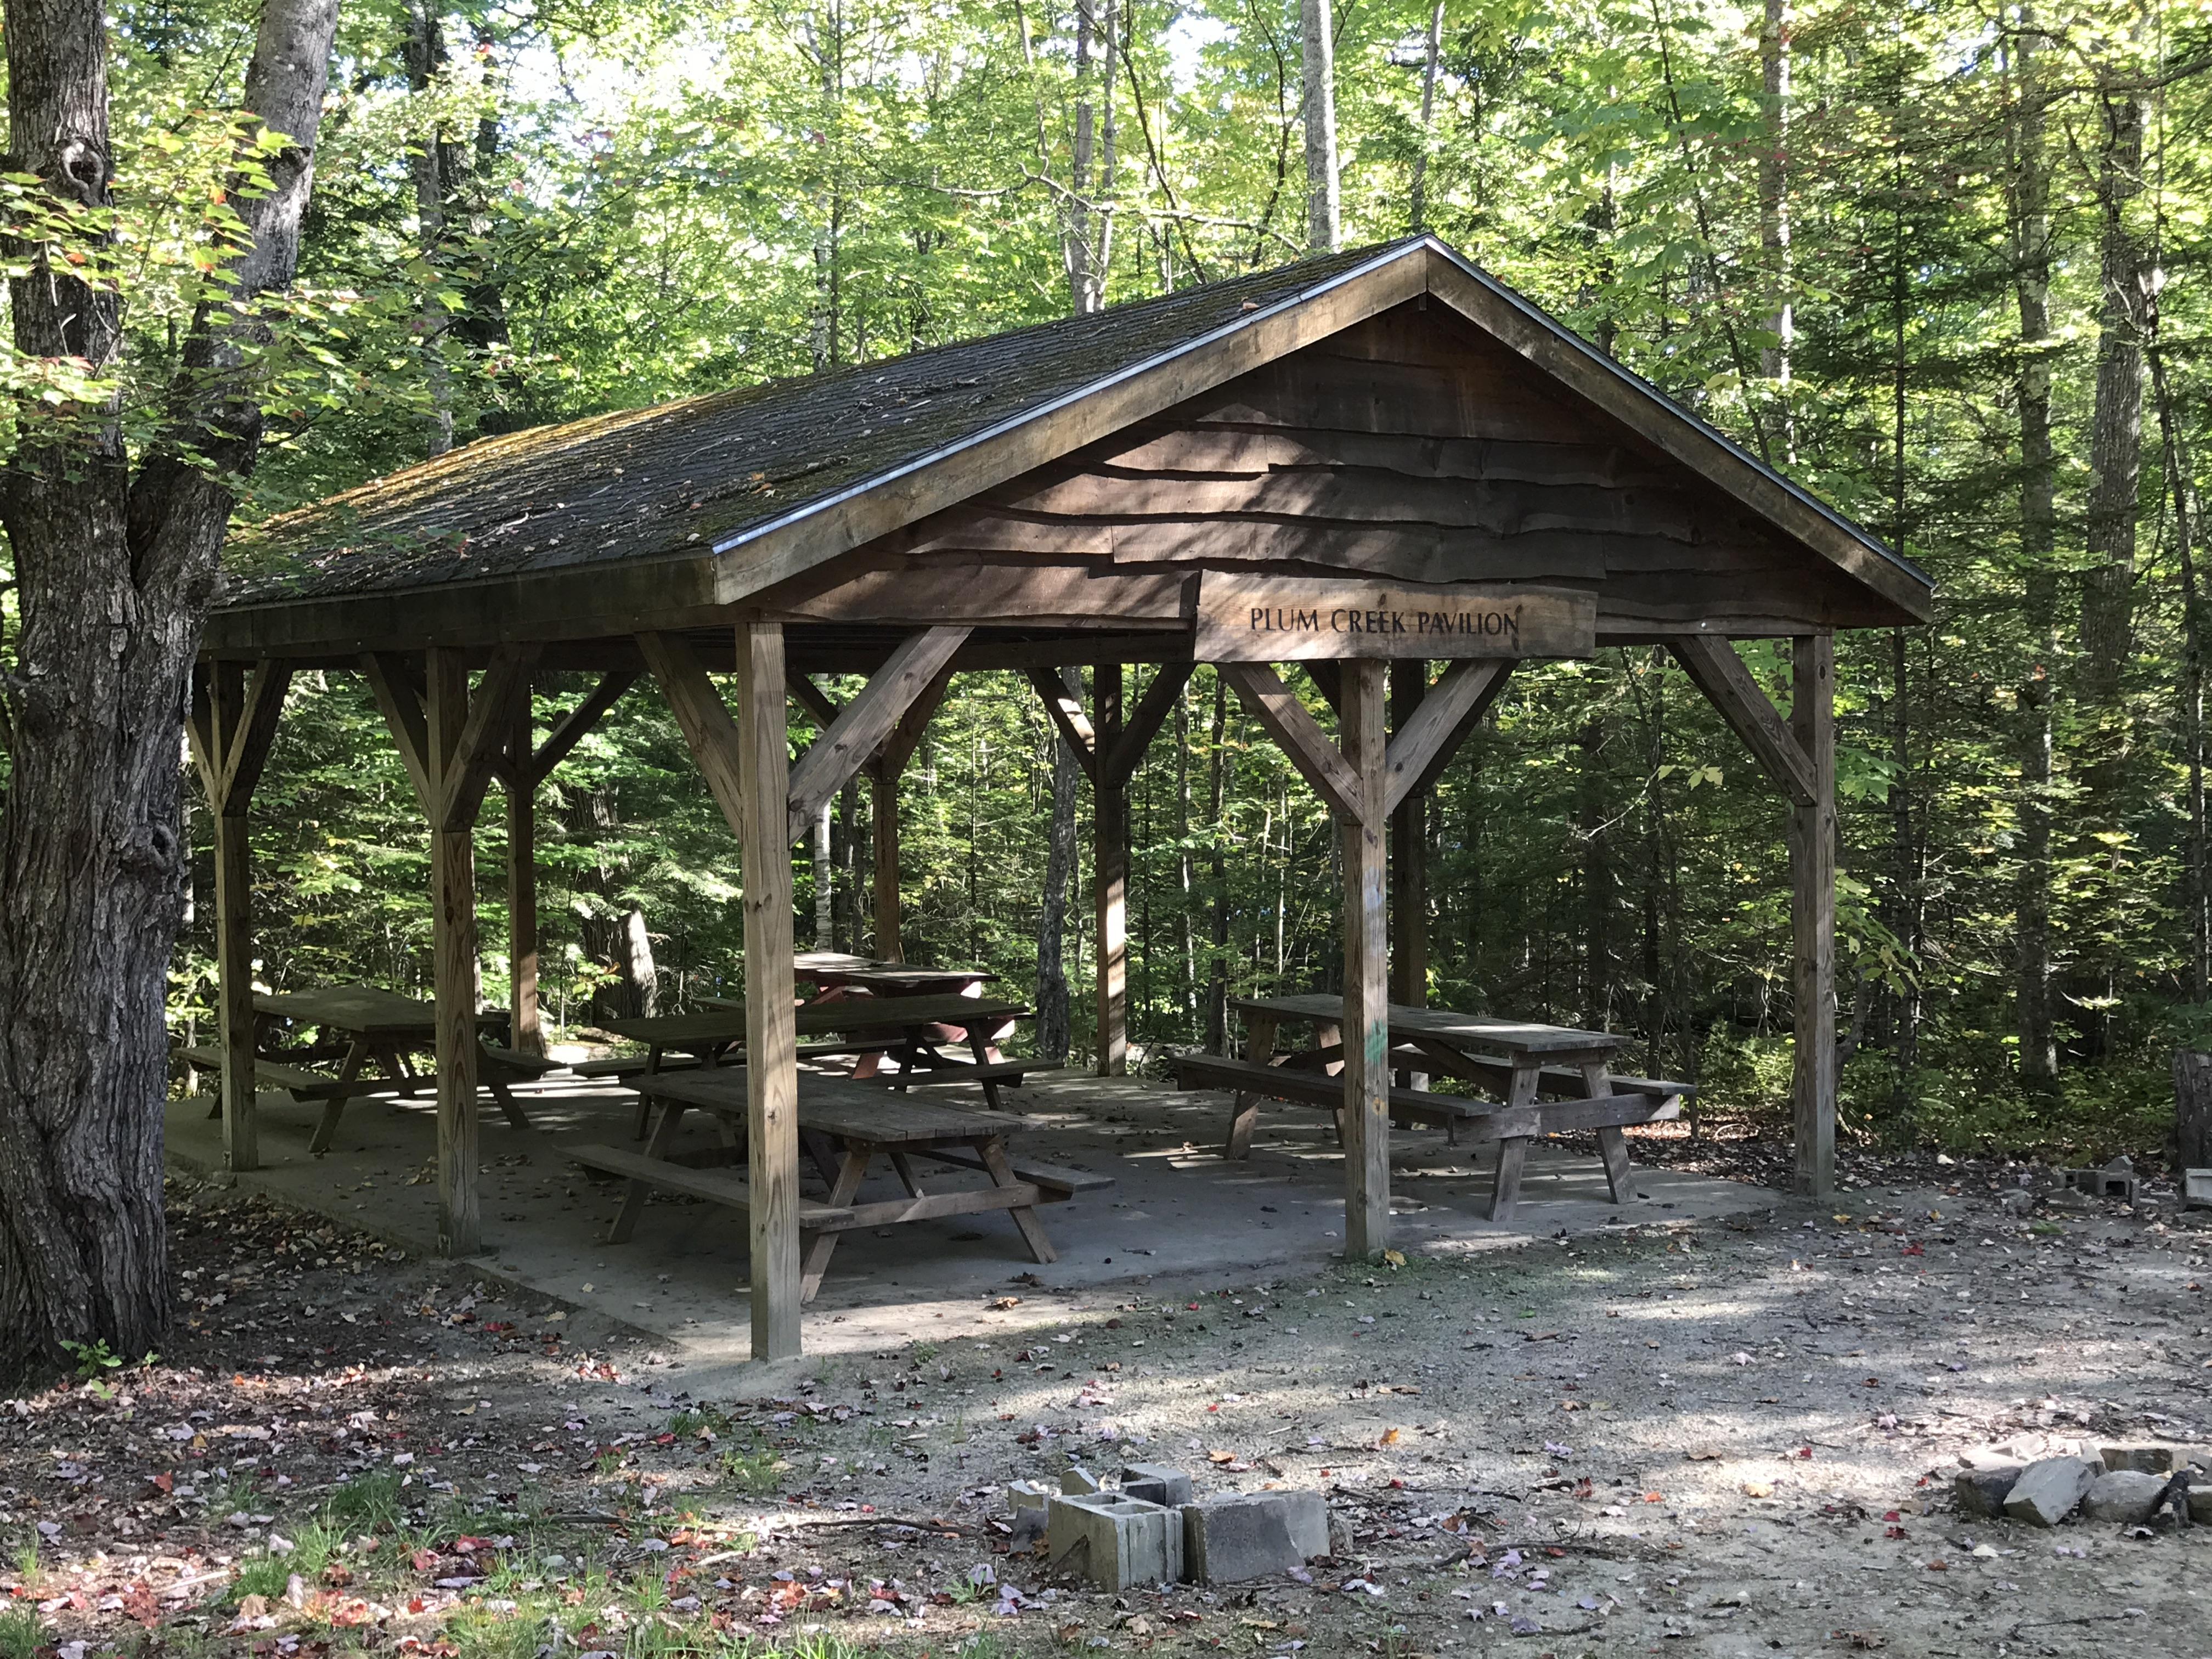 Plum Creek Pavilion